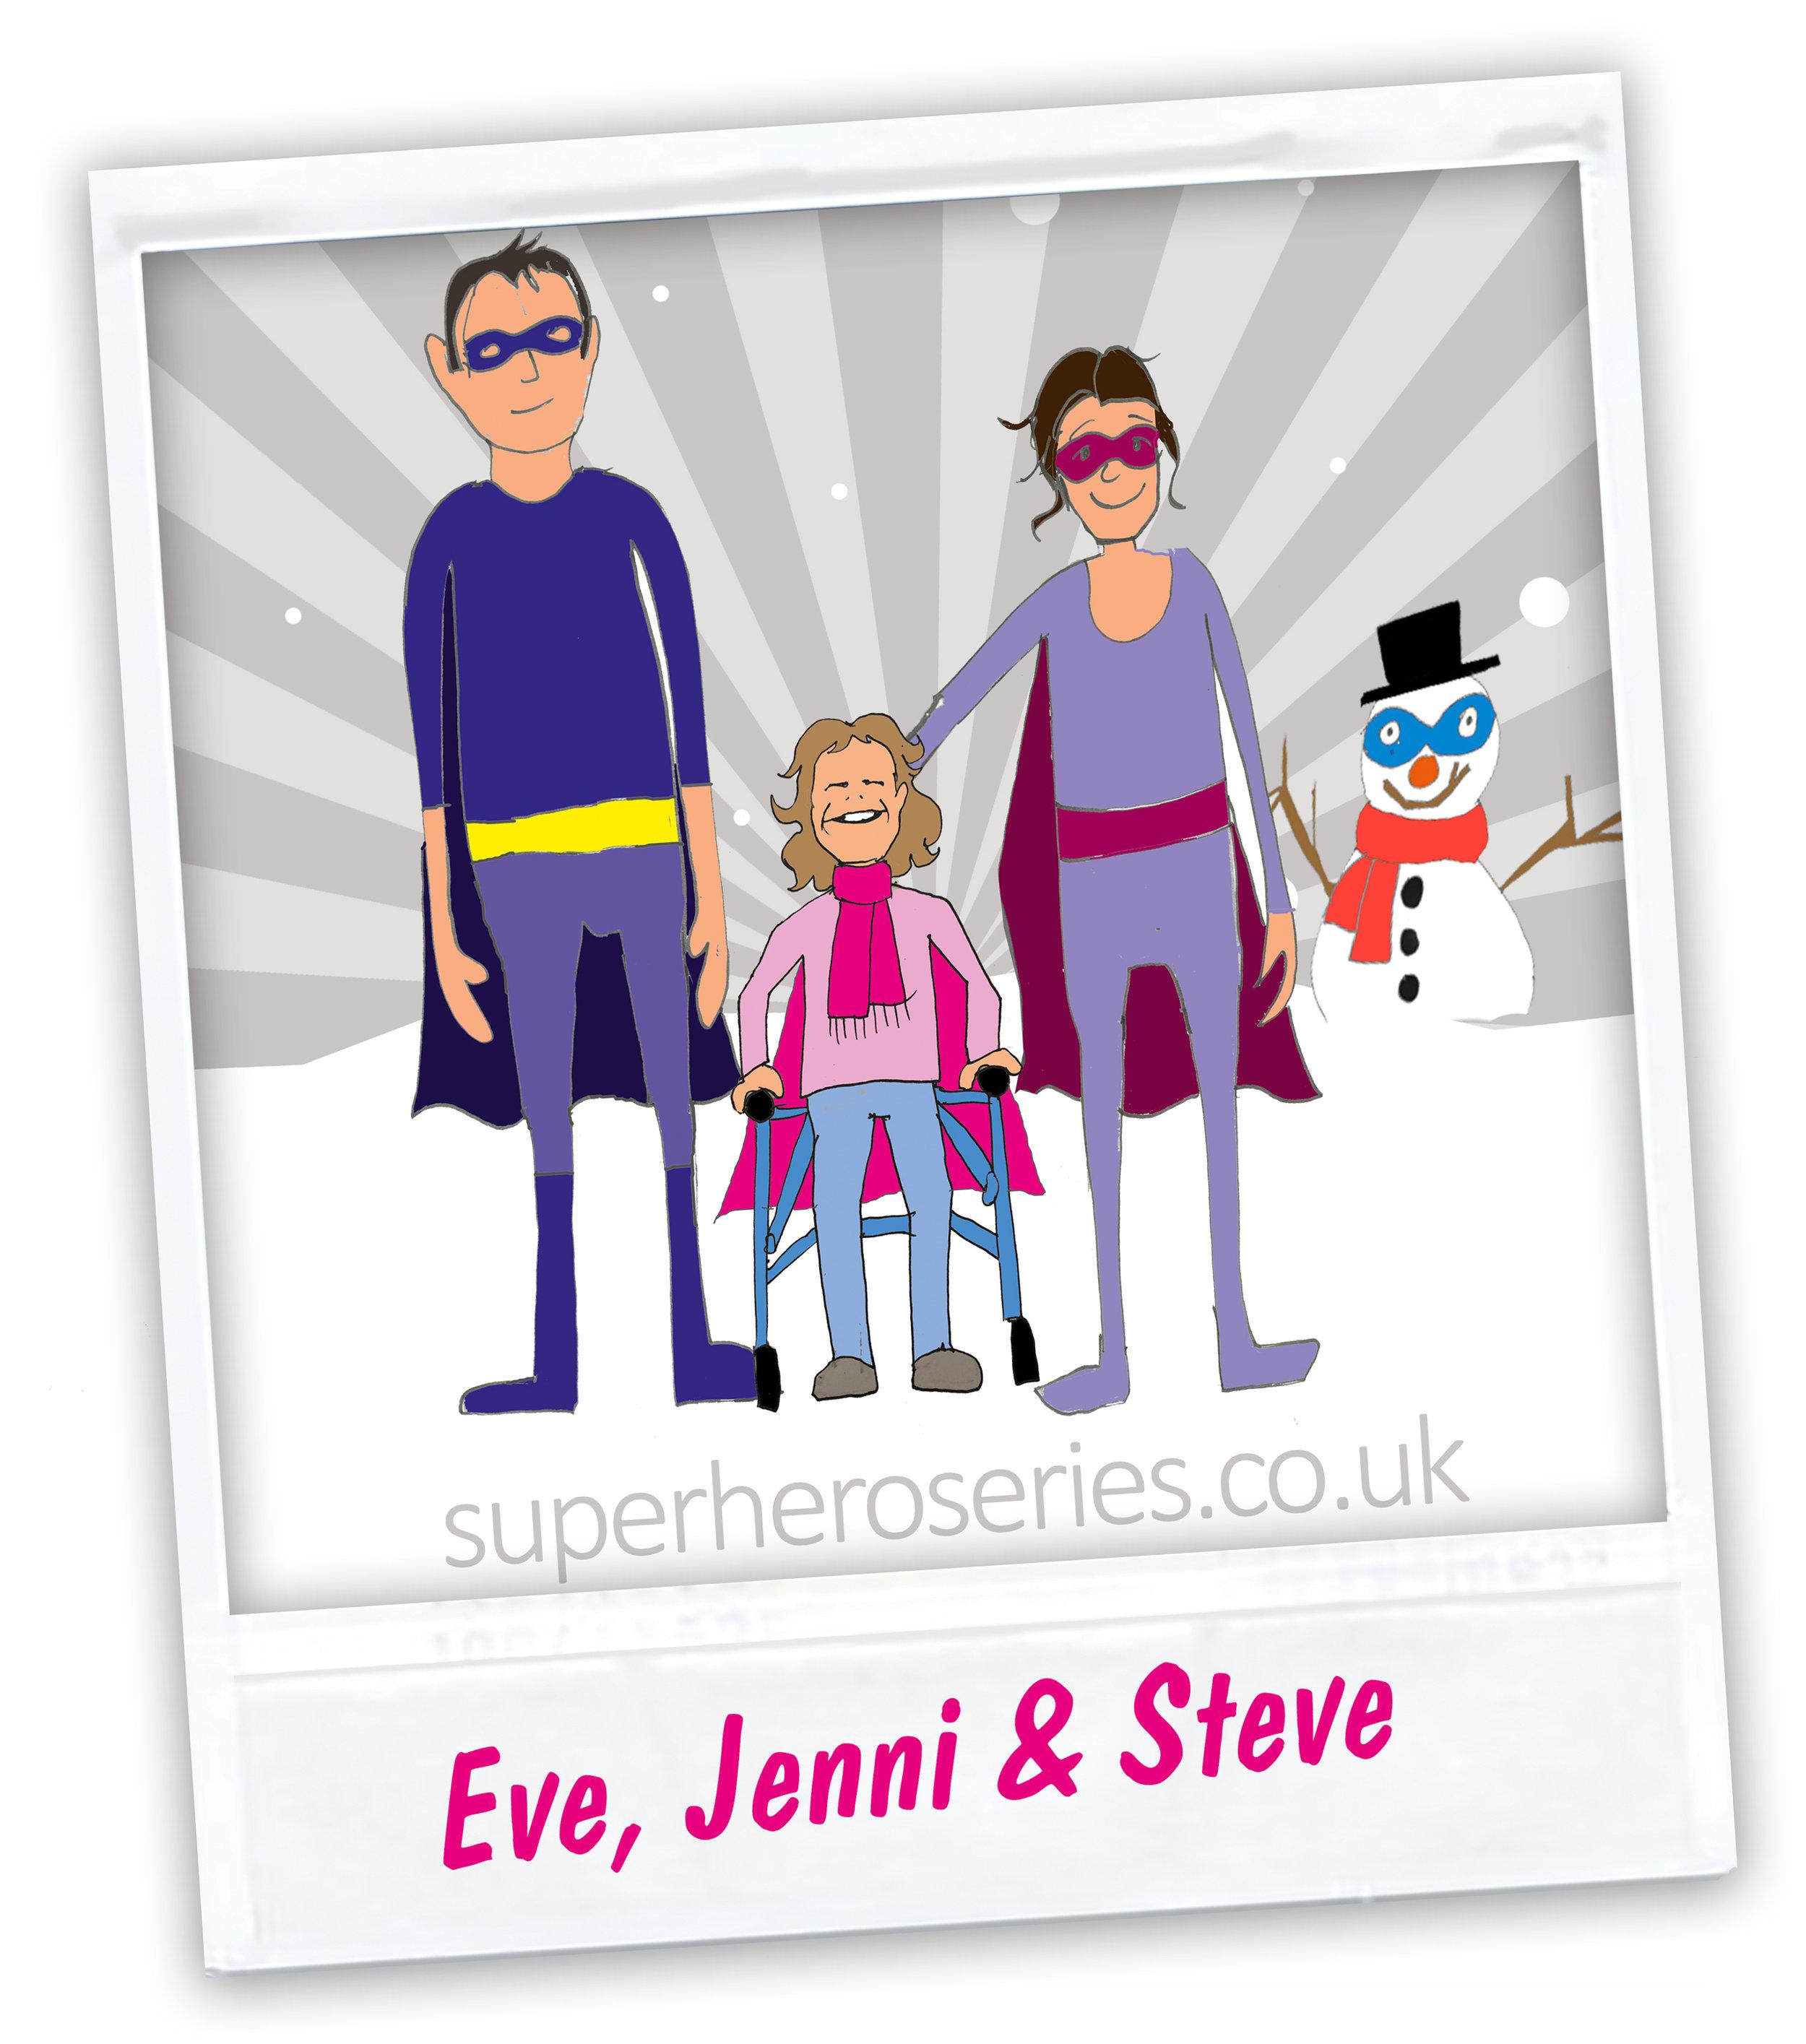 Eve Jenni & Steve b.jpg